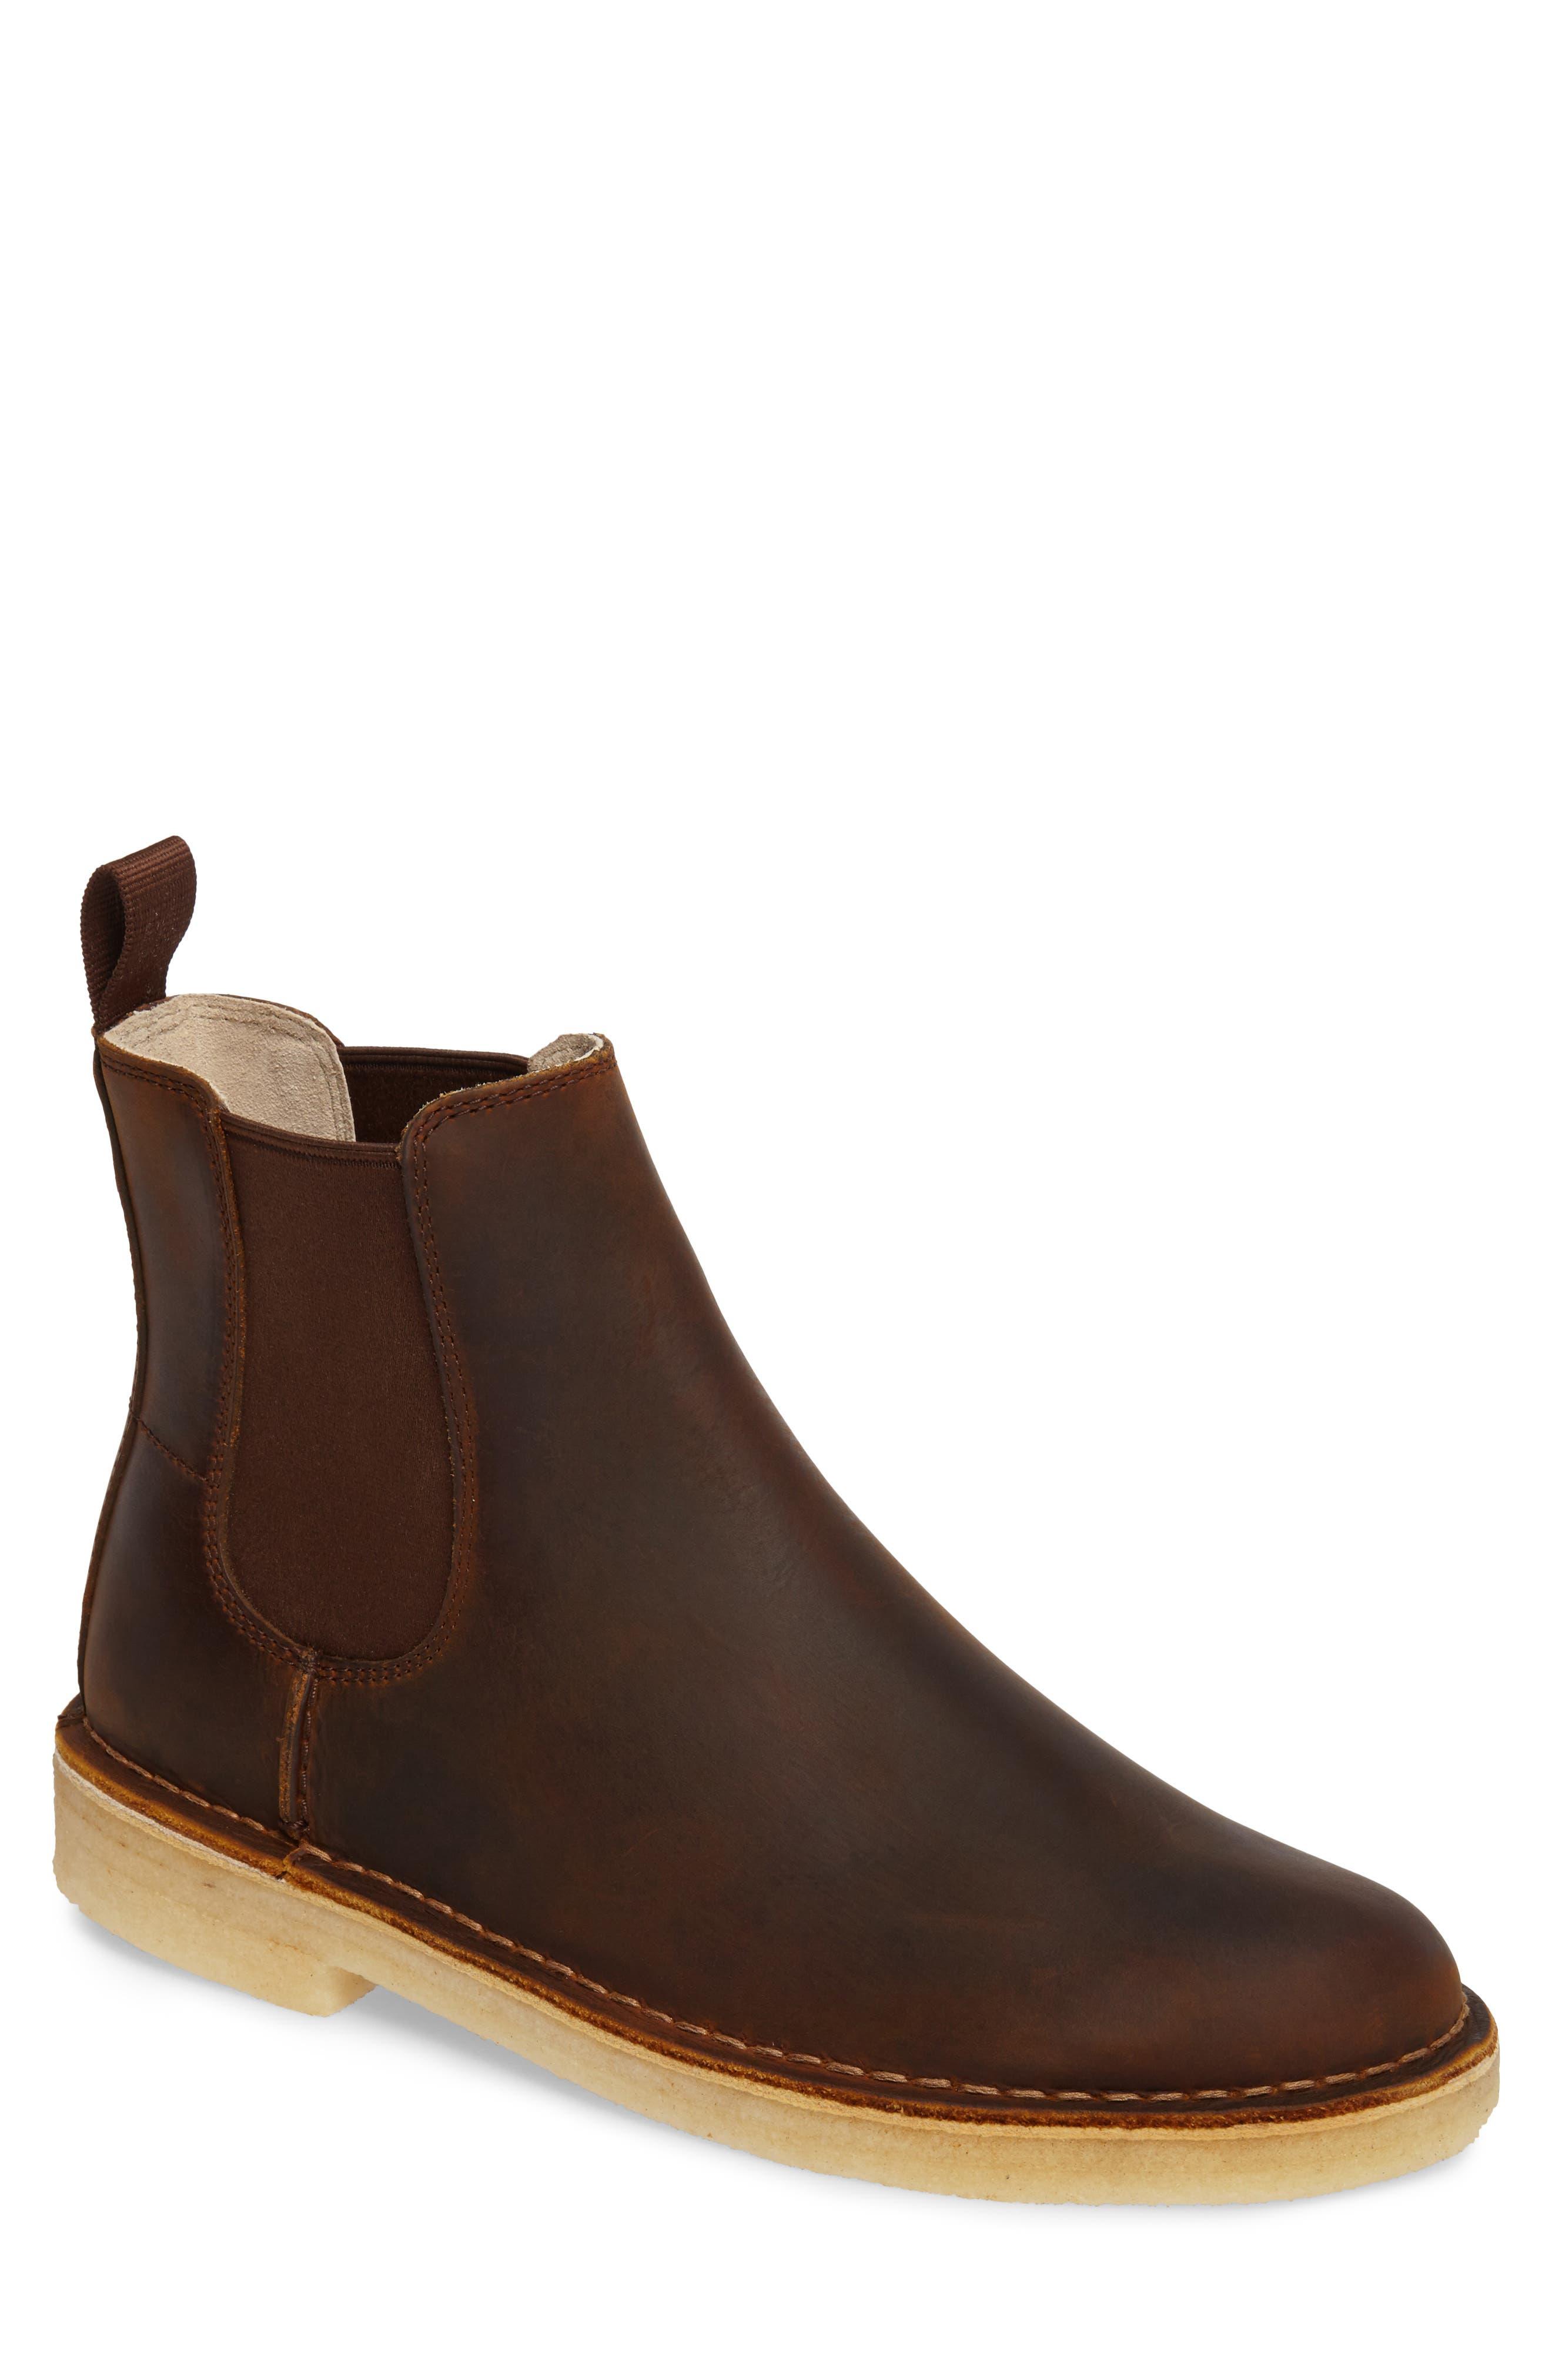 CLARKS<SUP>®</SUP> Desert Peak Chelsea Boot, Main, color, MEDIUM BROWN BEESWAX LEATHER